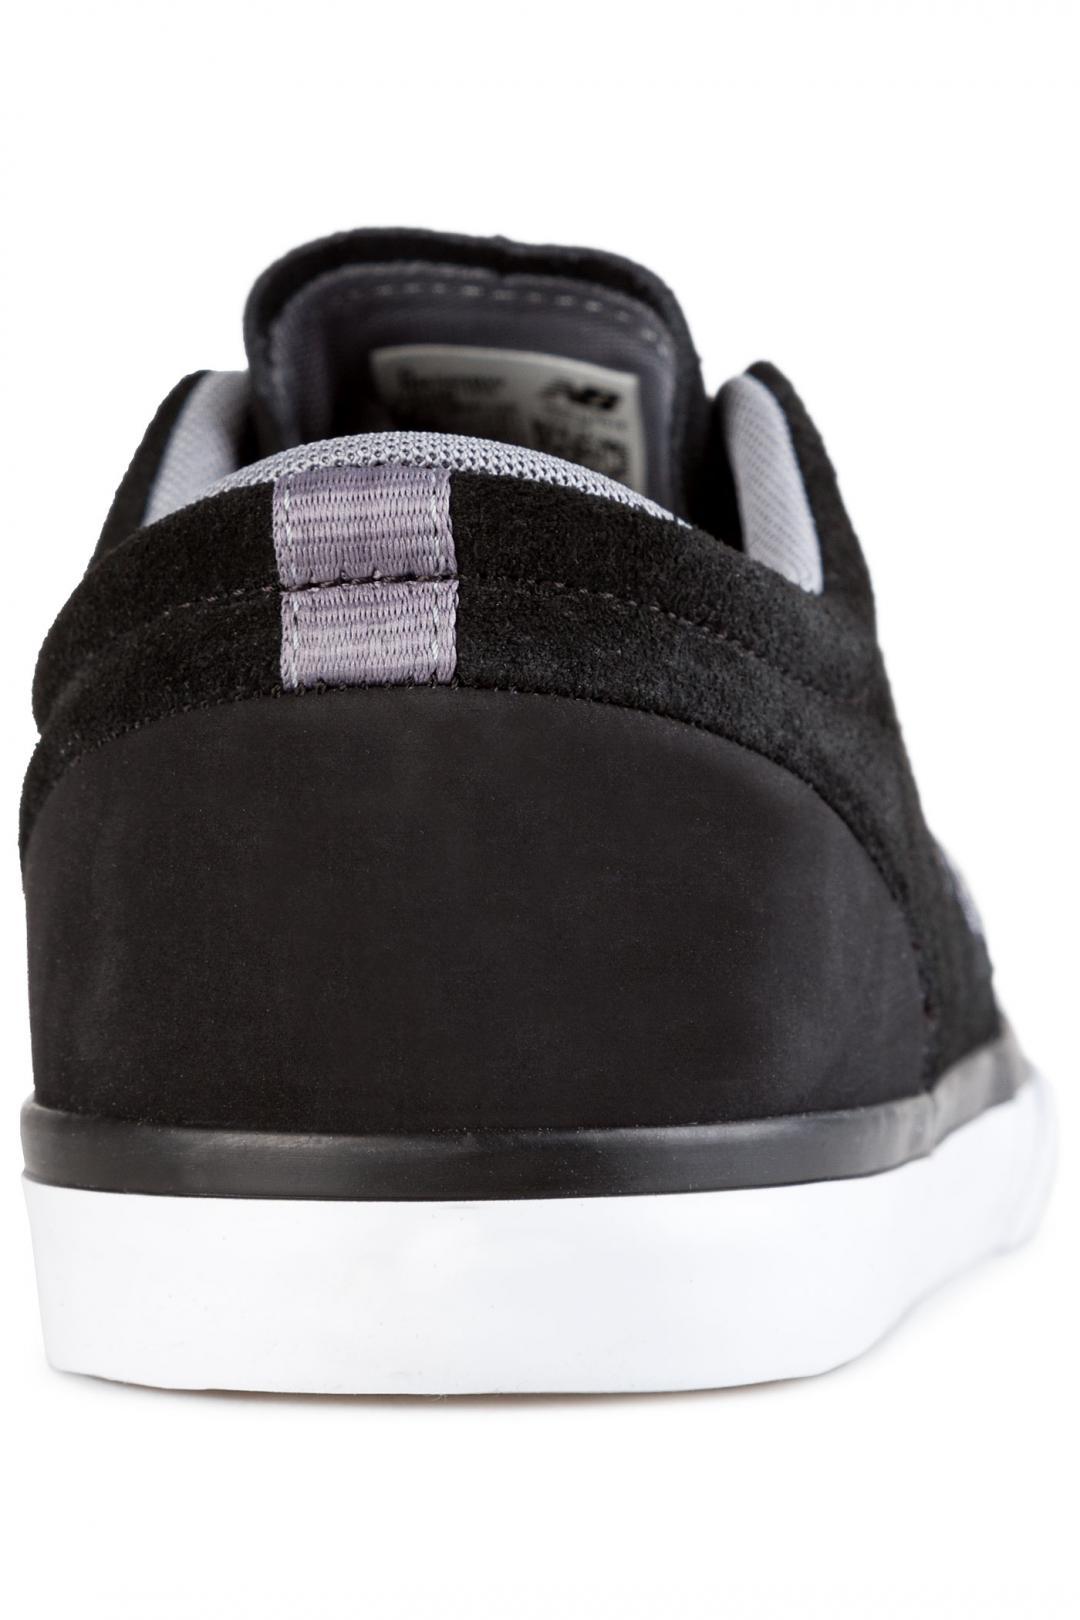 Uomo New Balance Numeric 345 black white | Sneakers low top